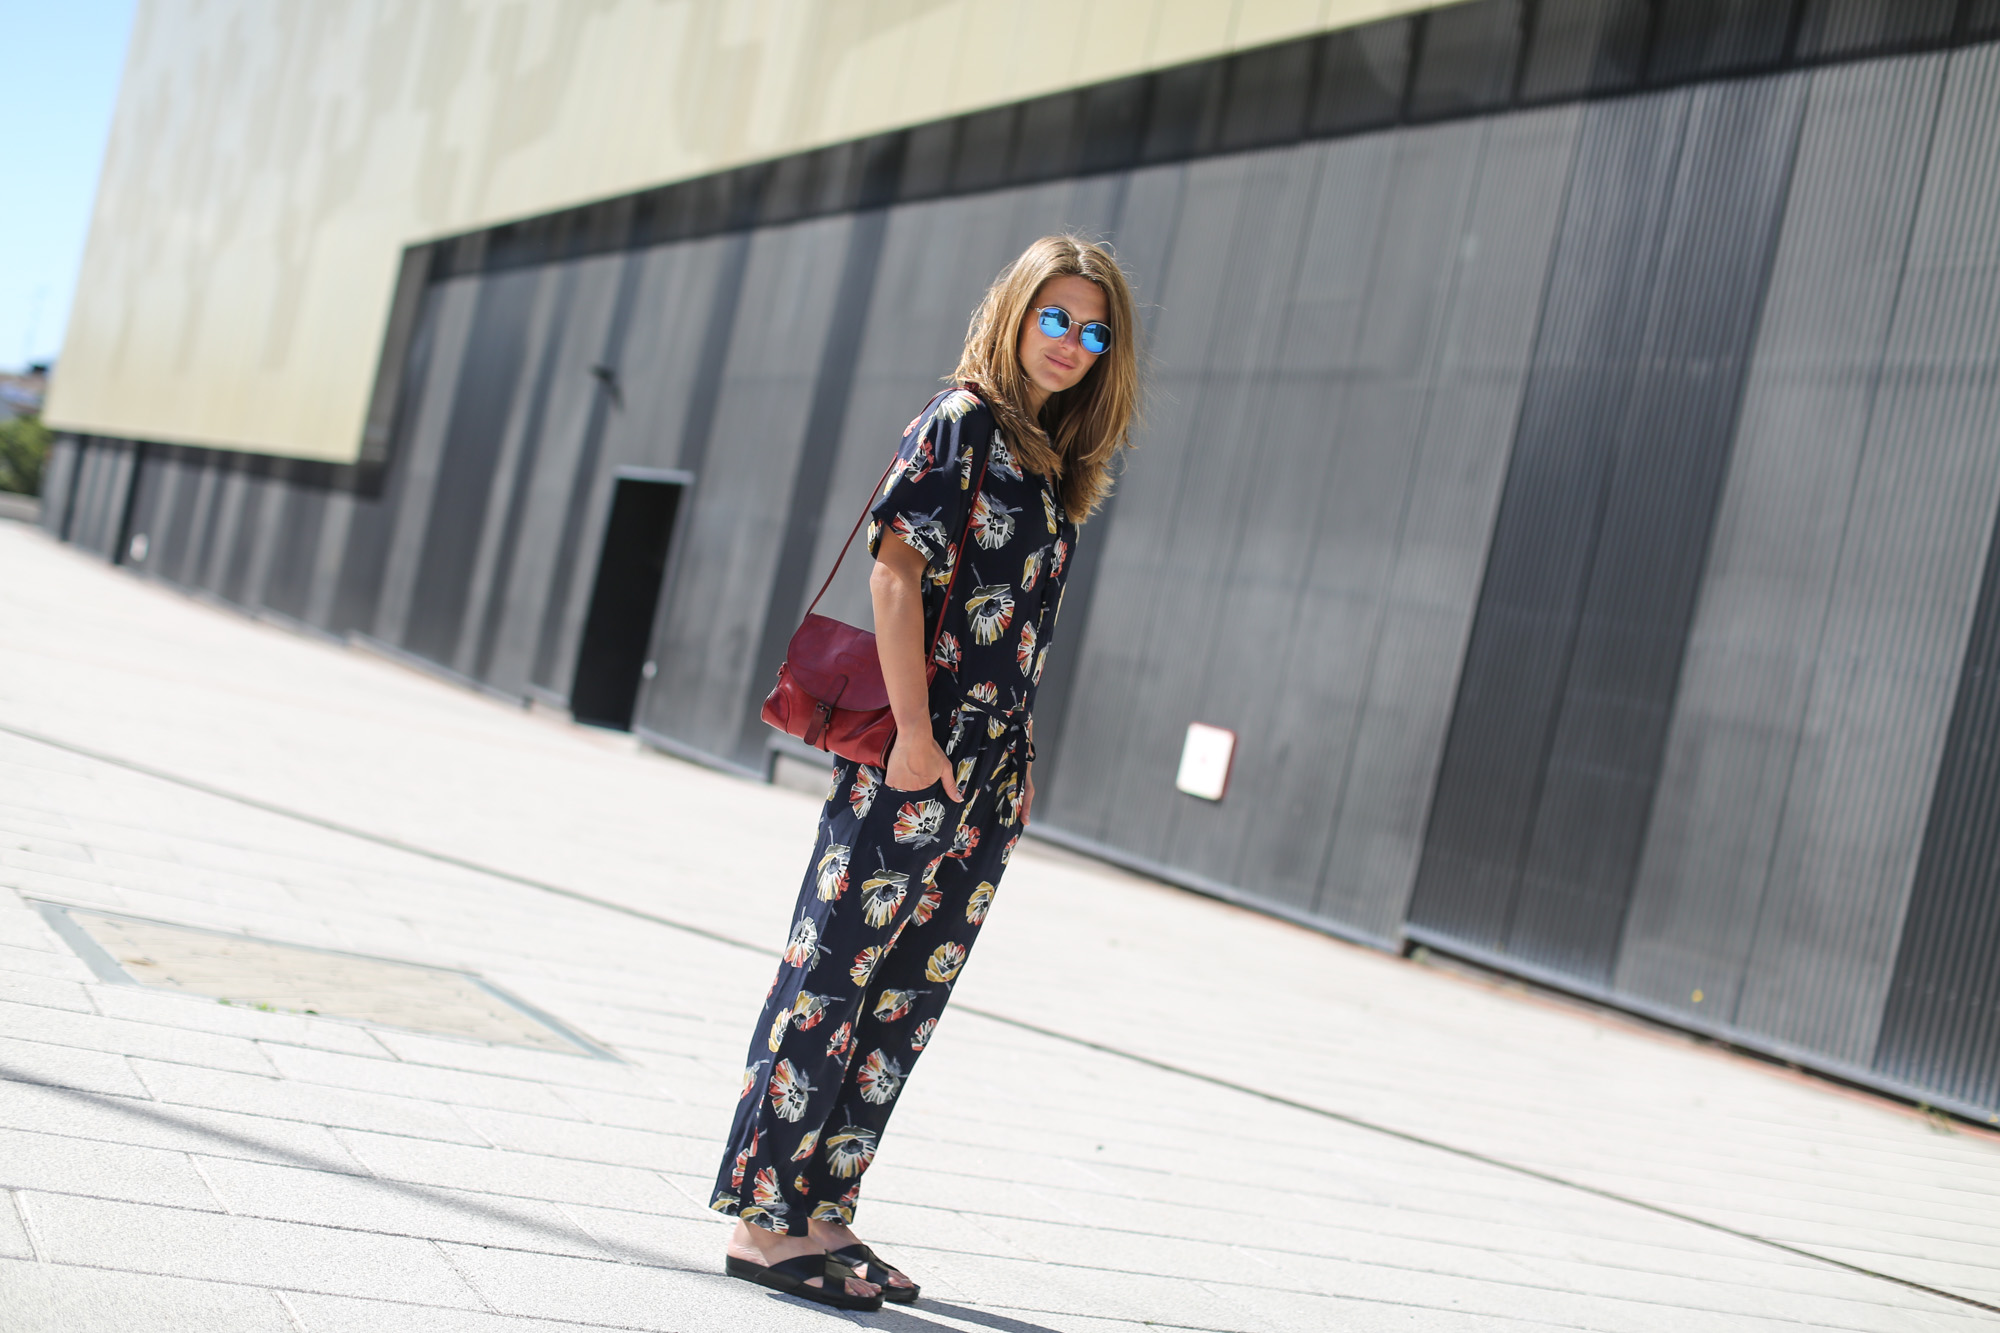 Clochet-streetstyle-vagabond-sliders-zara-flowers-jumpsuit-6